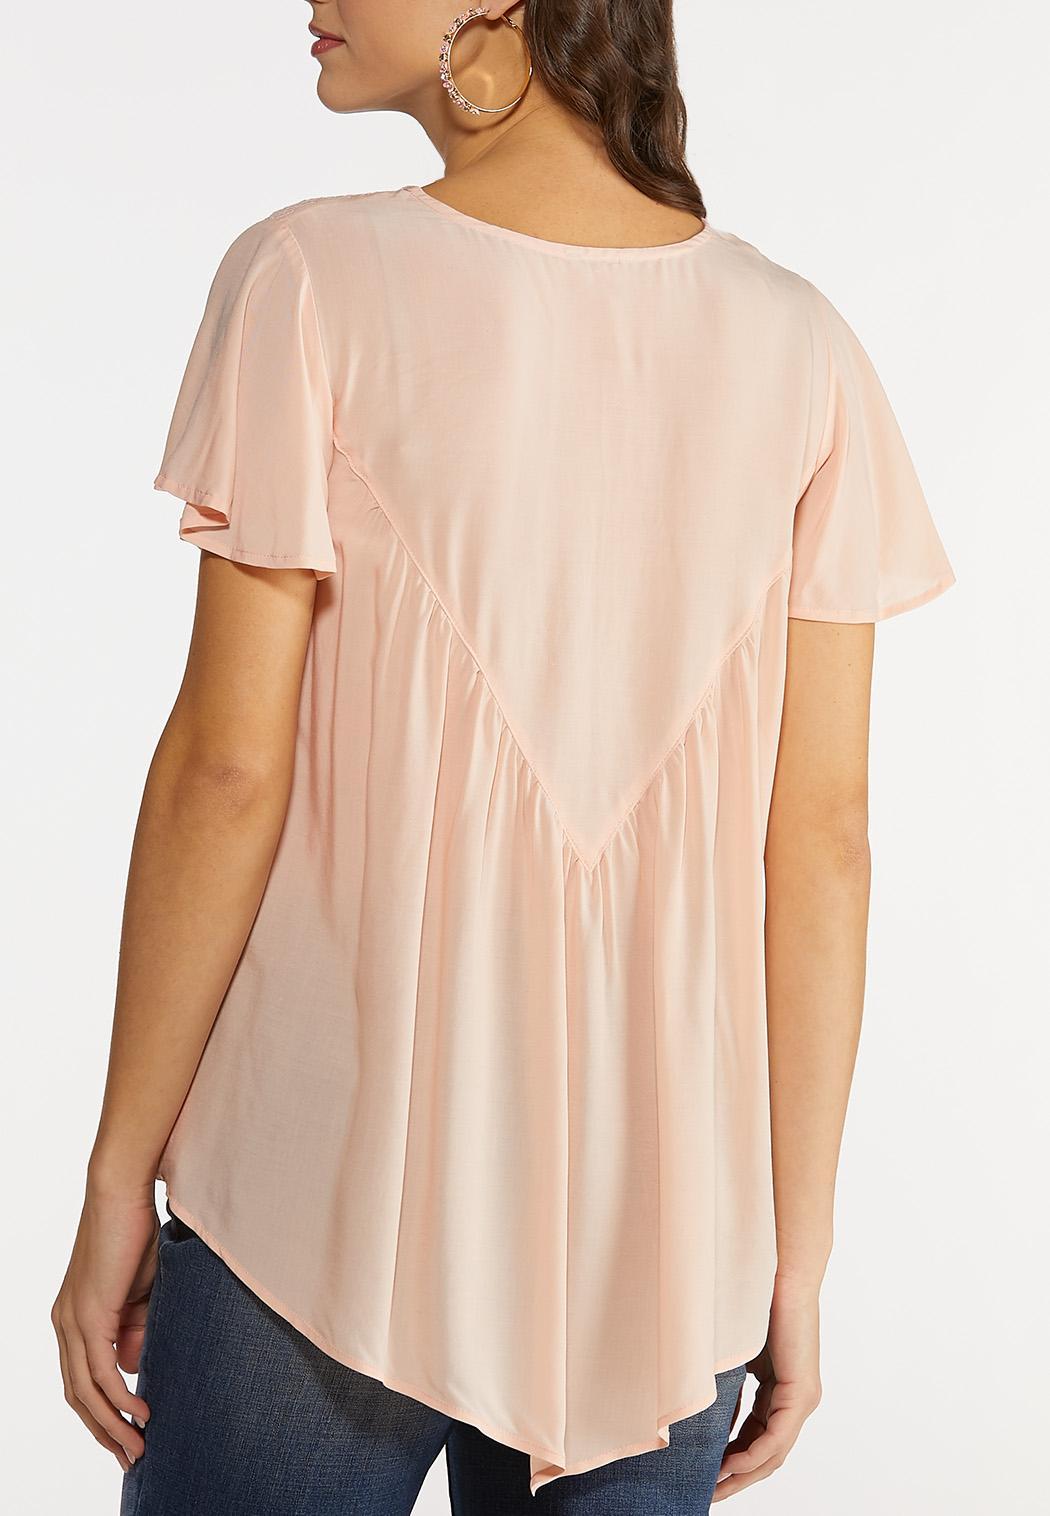 Blush Flutter Sleeve Top (Item #44182403)